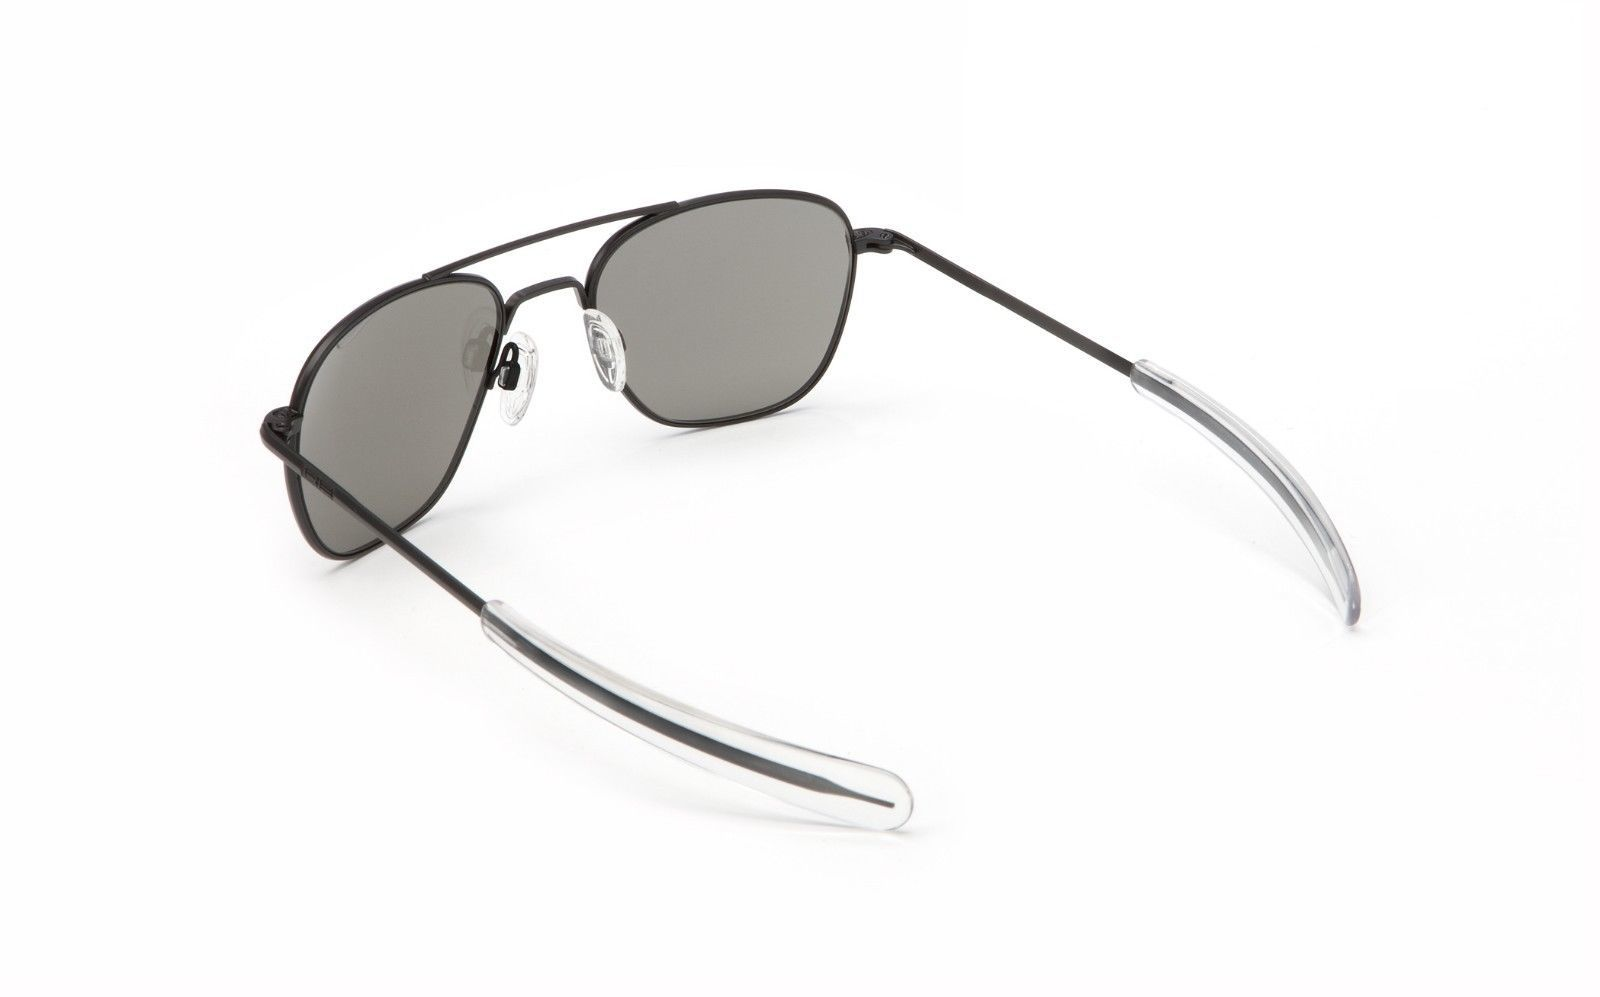 a6ea14aaf10 Randolph AF068 55mm Matte Black Bayonet Gray Polarized Aviator 2018  Sunglasses